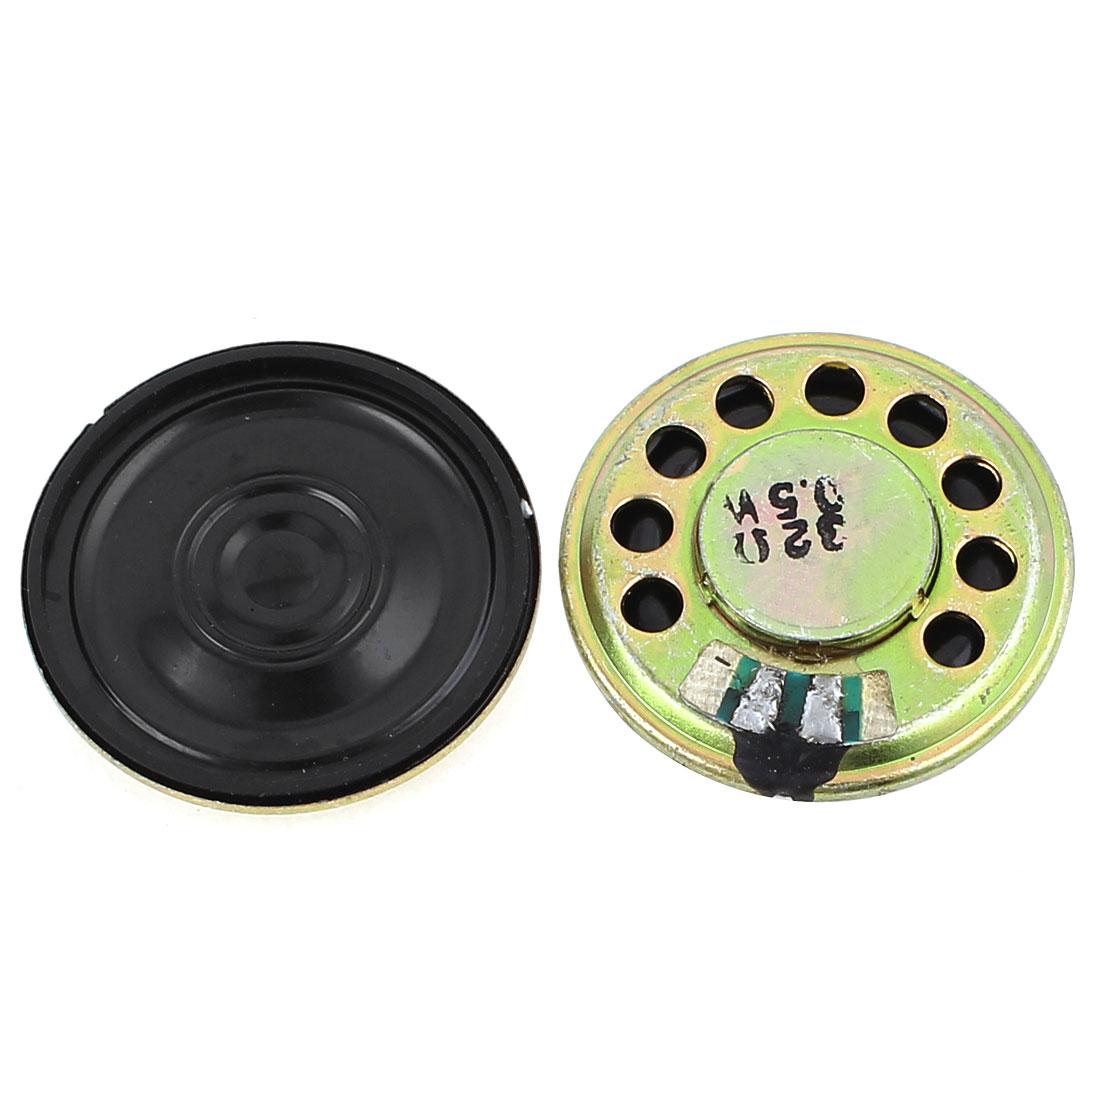 2 Pcs 0.5W 32 Ohm 29mm Round Inside Magnet Electronic Speaker Loudspeaker